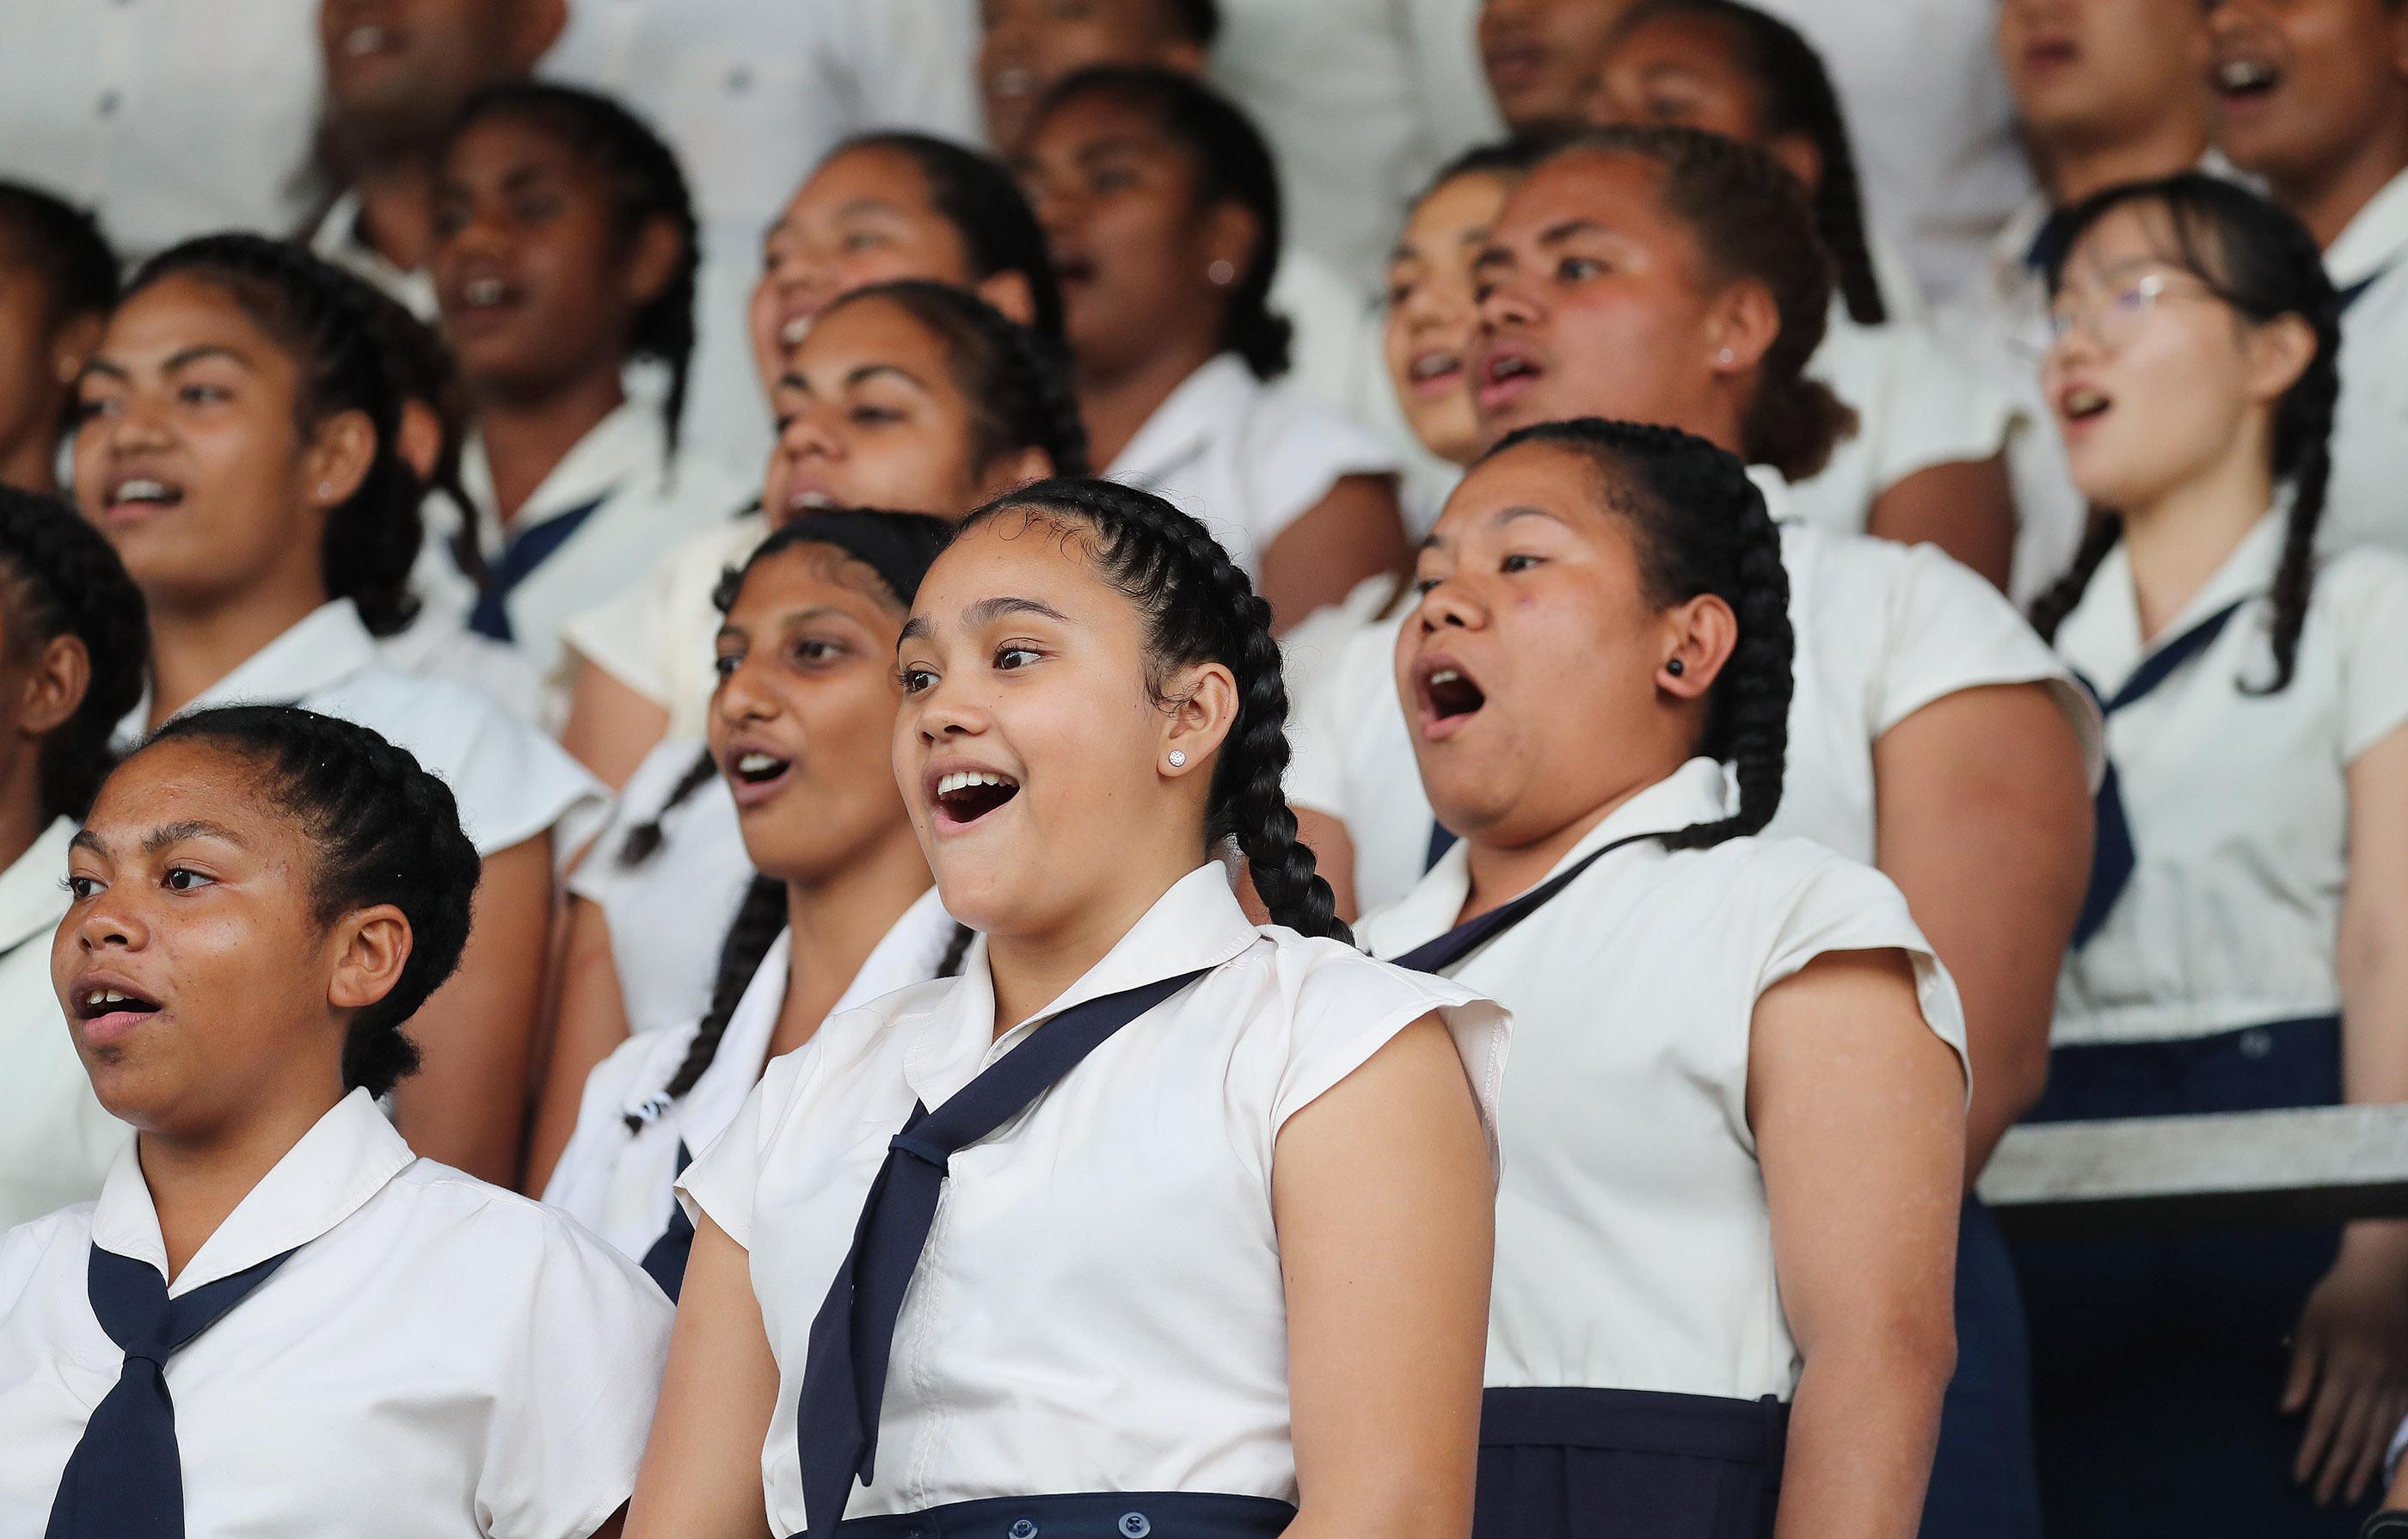 The choir sings during a devotional at Ratu Cakobau stadium in Nausori, Fiji on May 22, 2019.